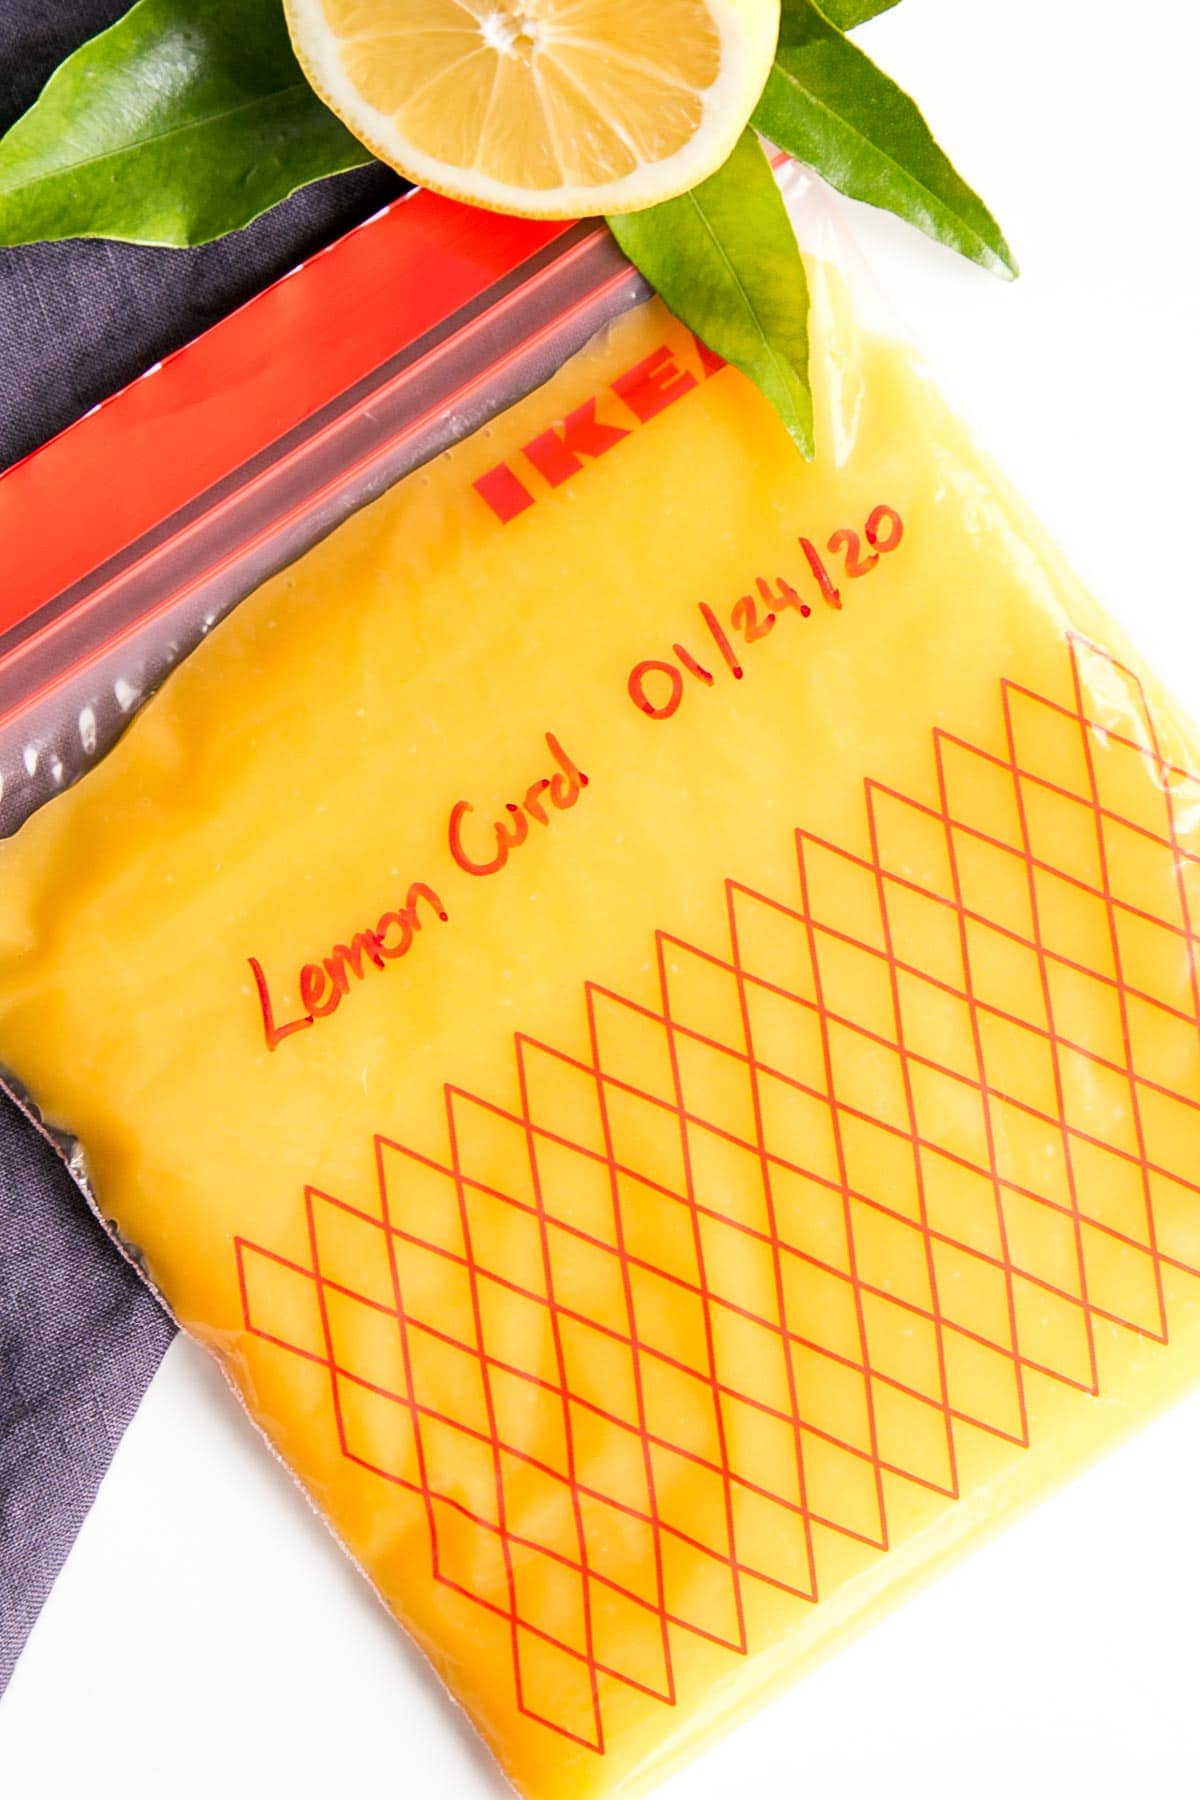 Lemon curd in a freezer bag.